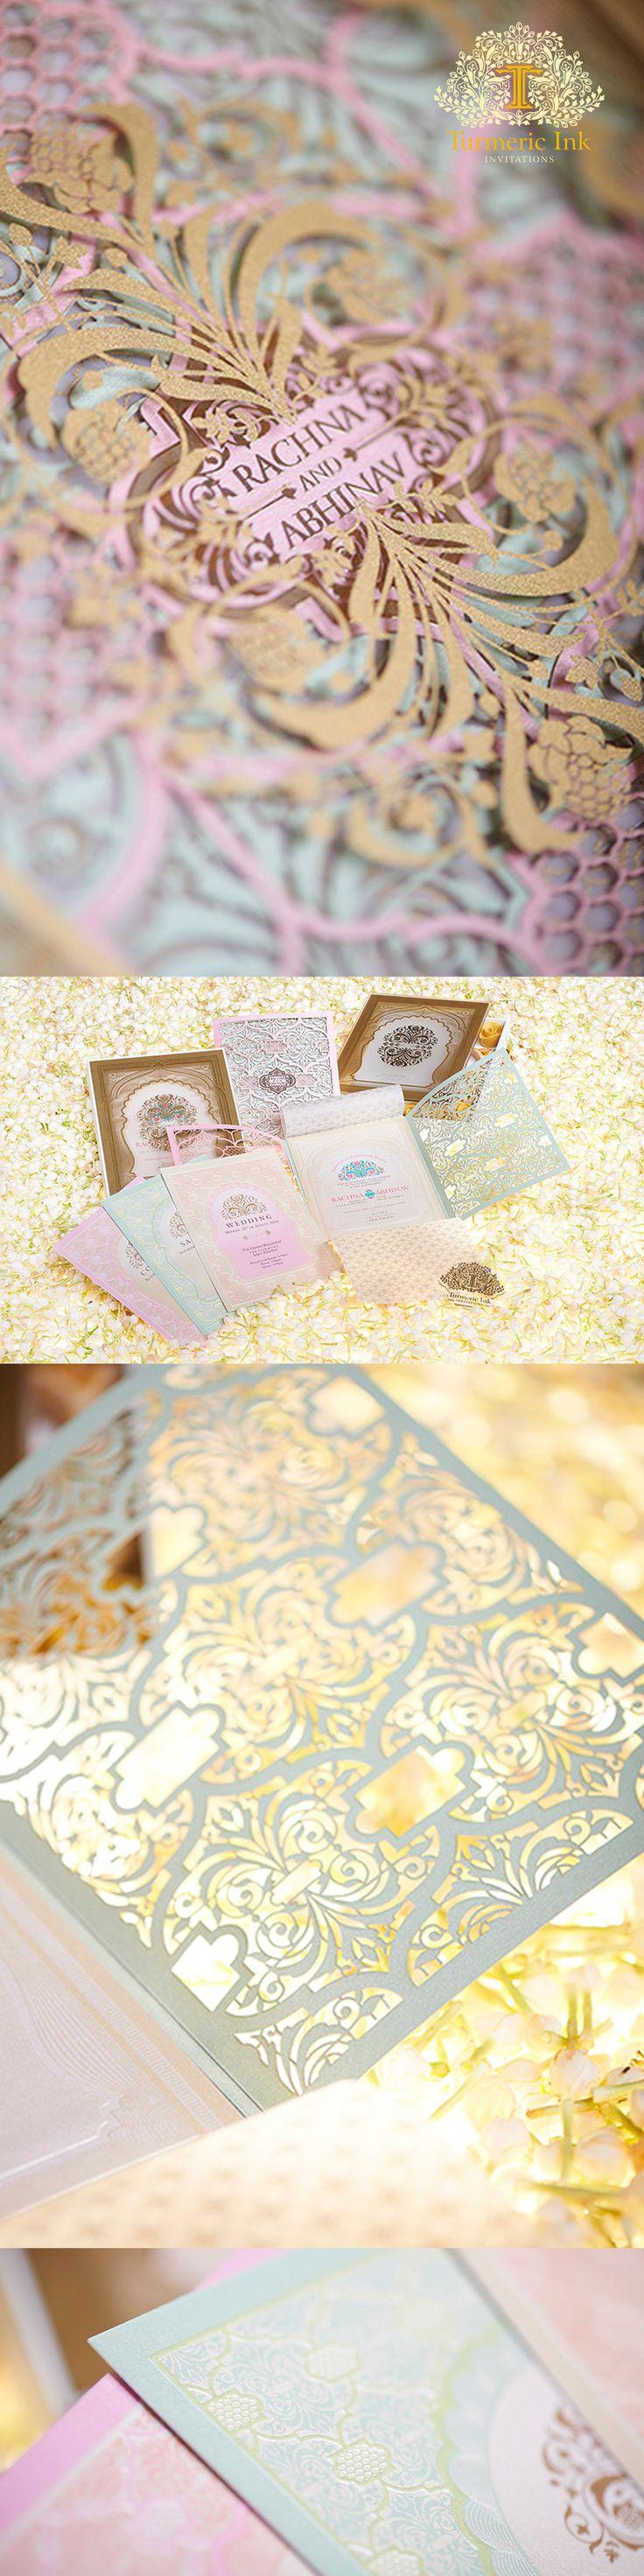 telugu wedding invitation cards online%0A invite  invitations  Indian wedding invite  wedding card  bride  indian  bride